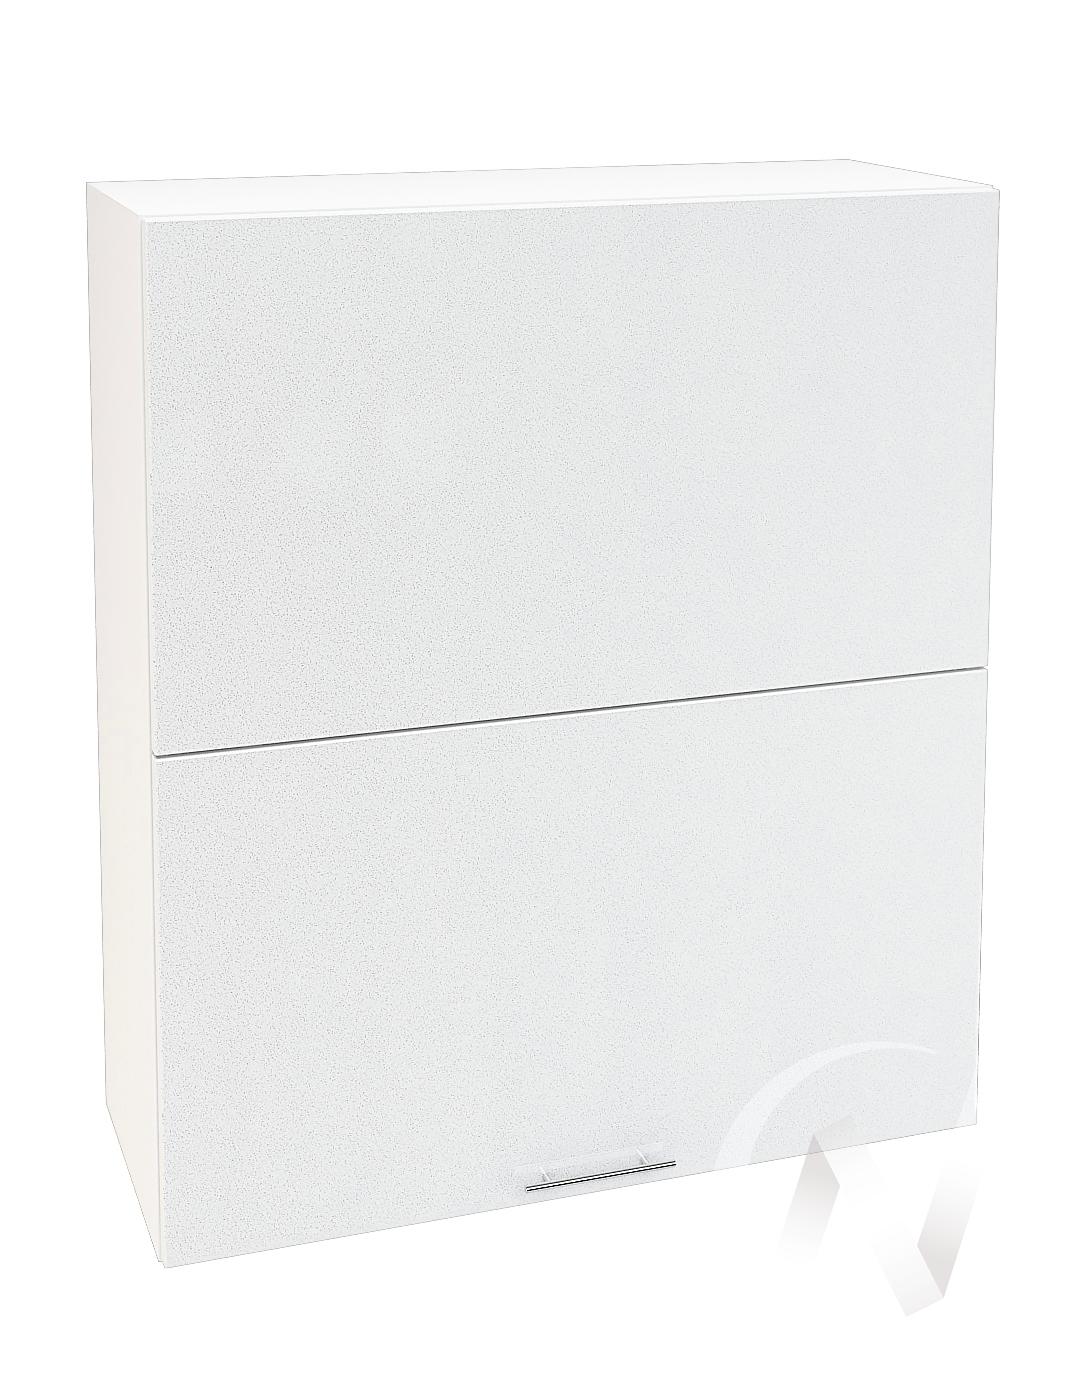 "Кухня ""Валерия-М"": Шкаф верхний горизонтальный 802, ШВГ 802 (белый металлик/корпус белый)"